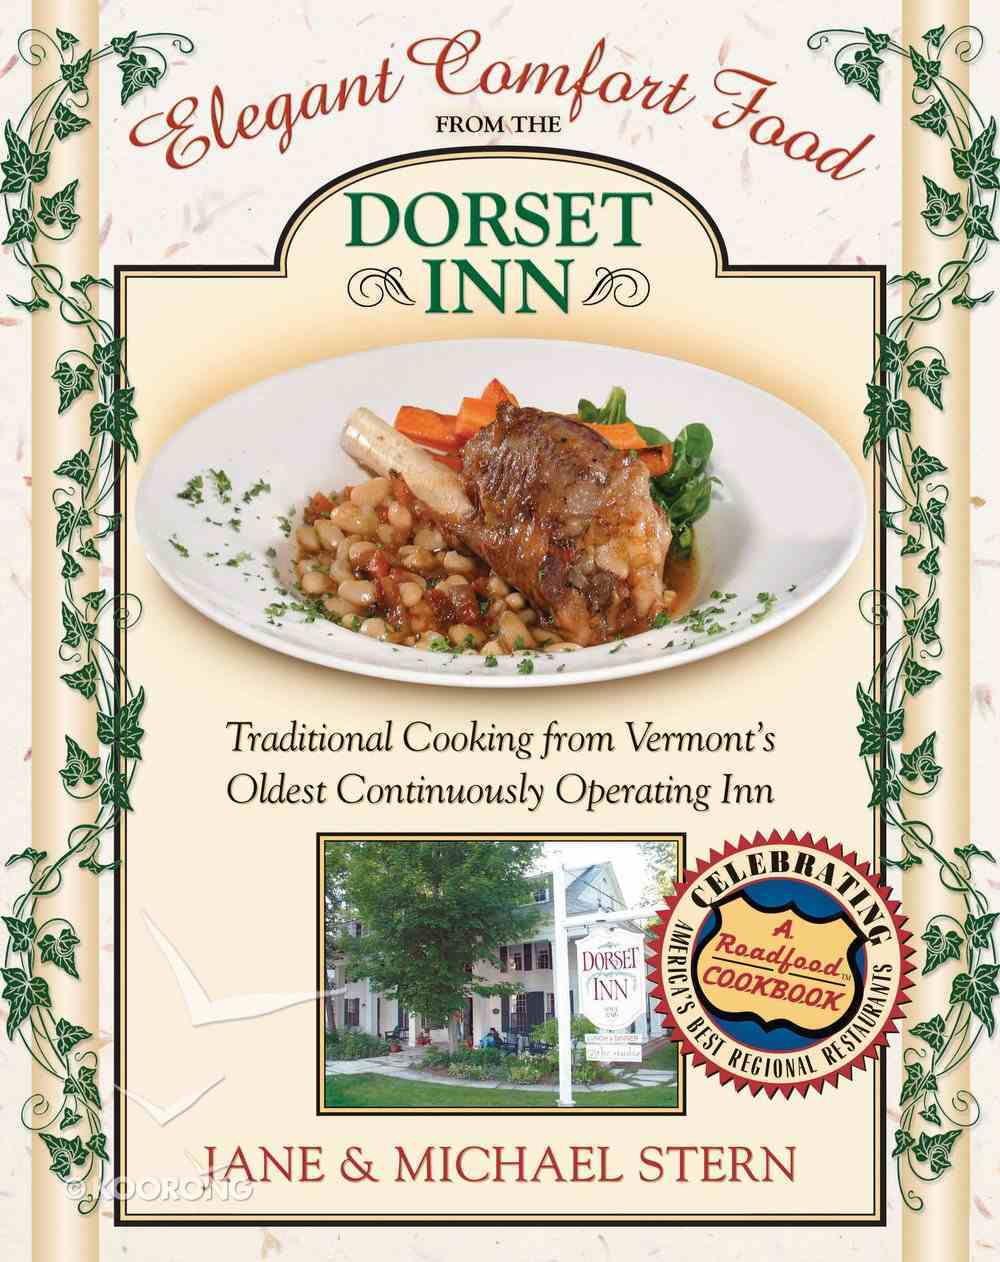 Elegant Comfort Food From Dorset Inn eBook